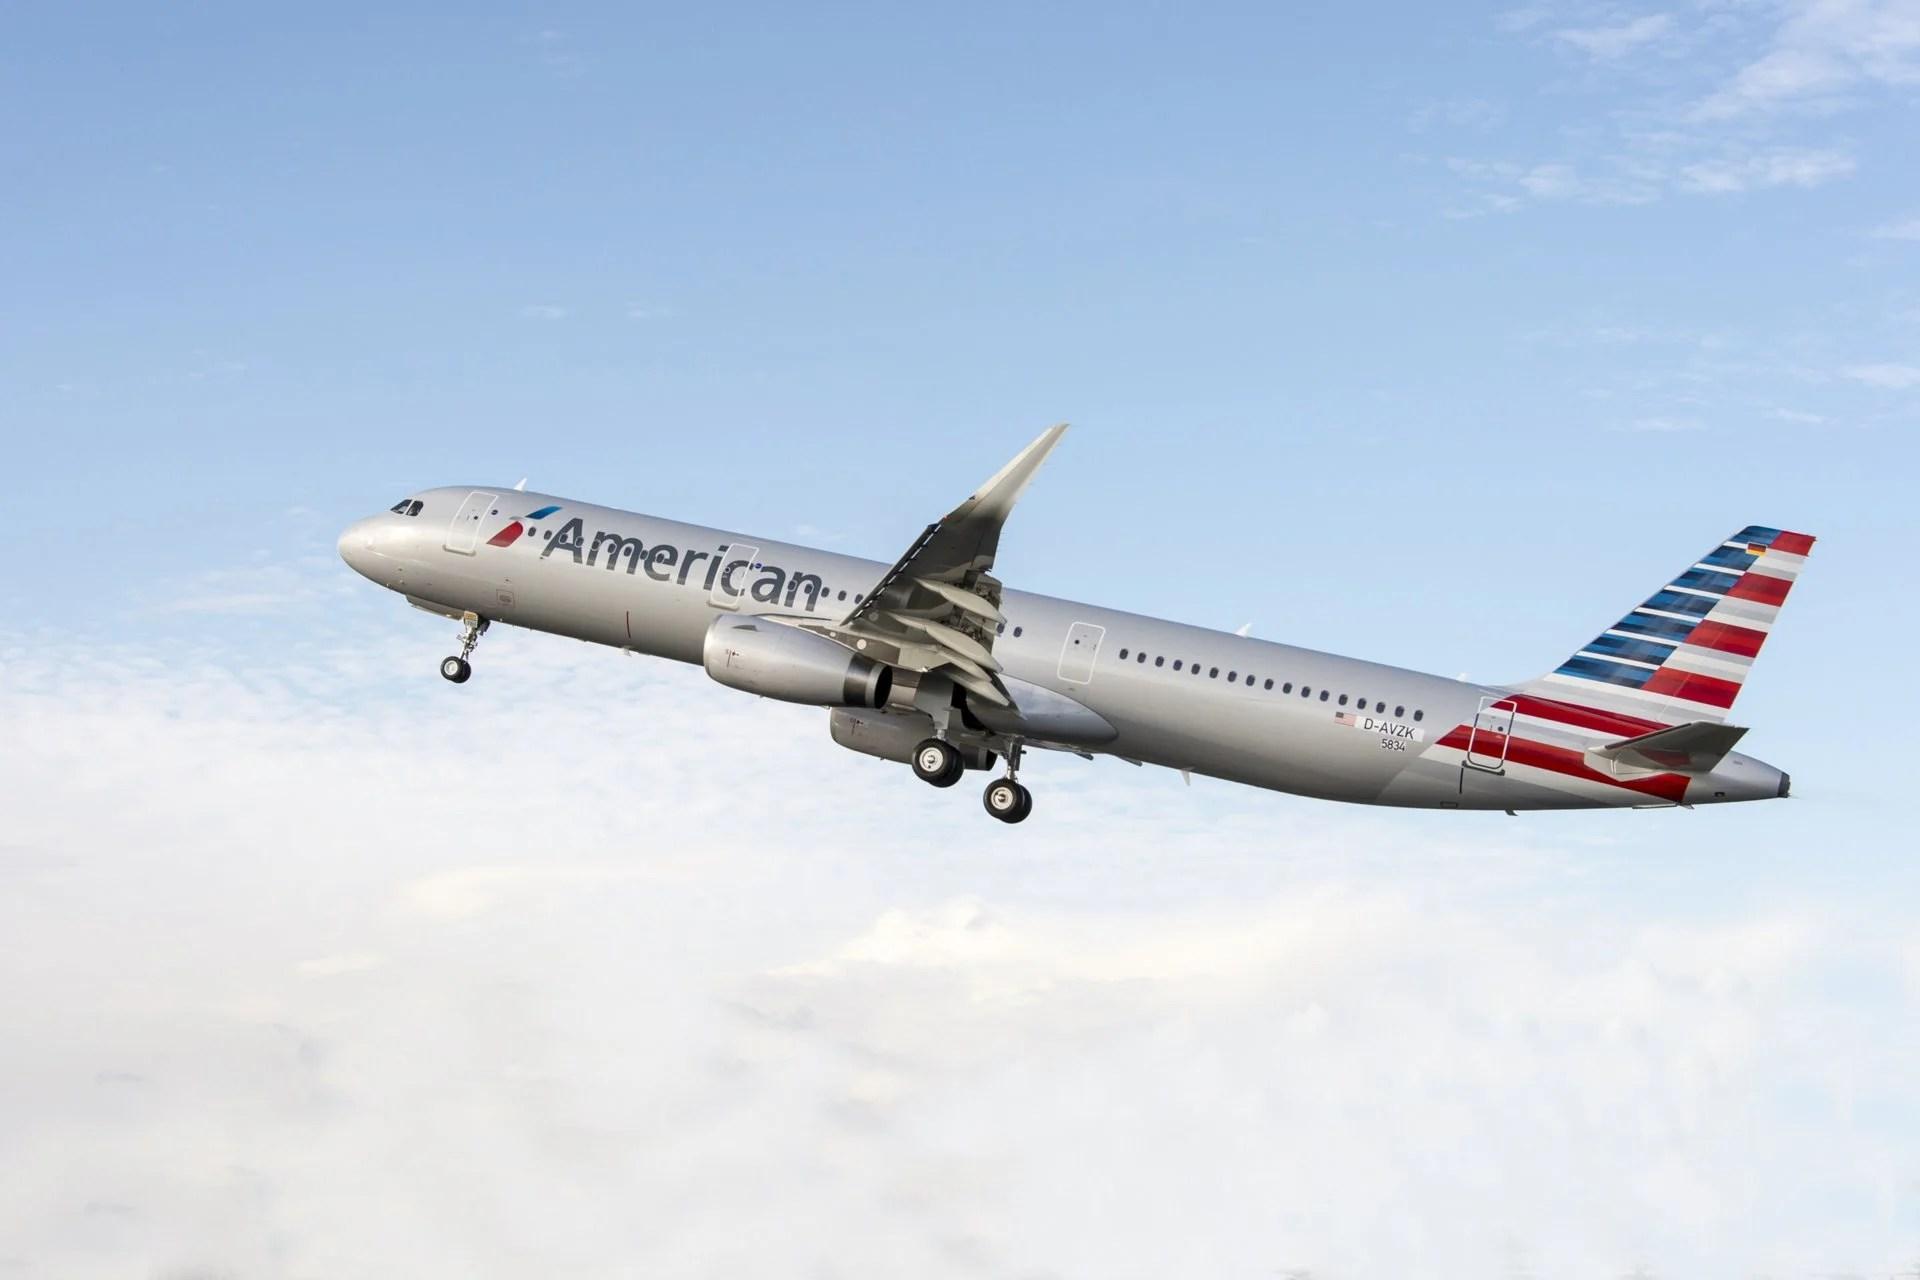 us airways airbus a321 seating chart - Yobi.karikaturize.com